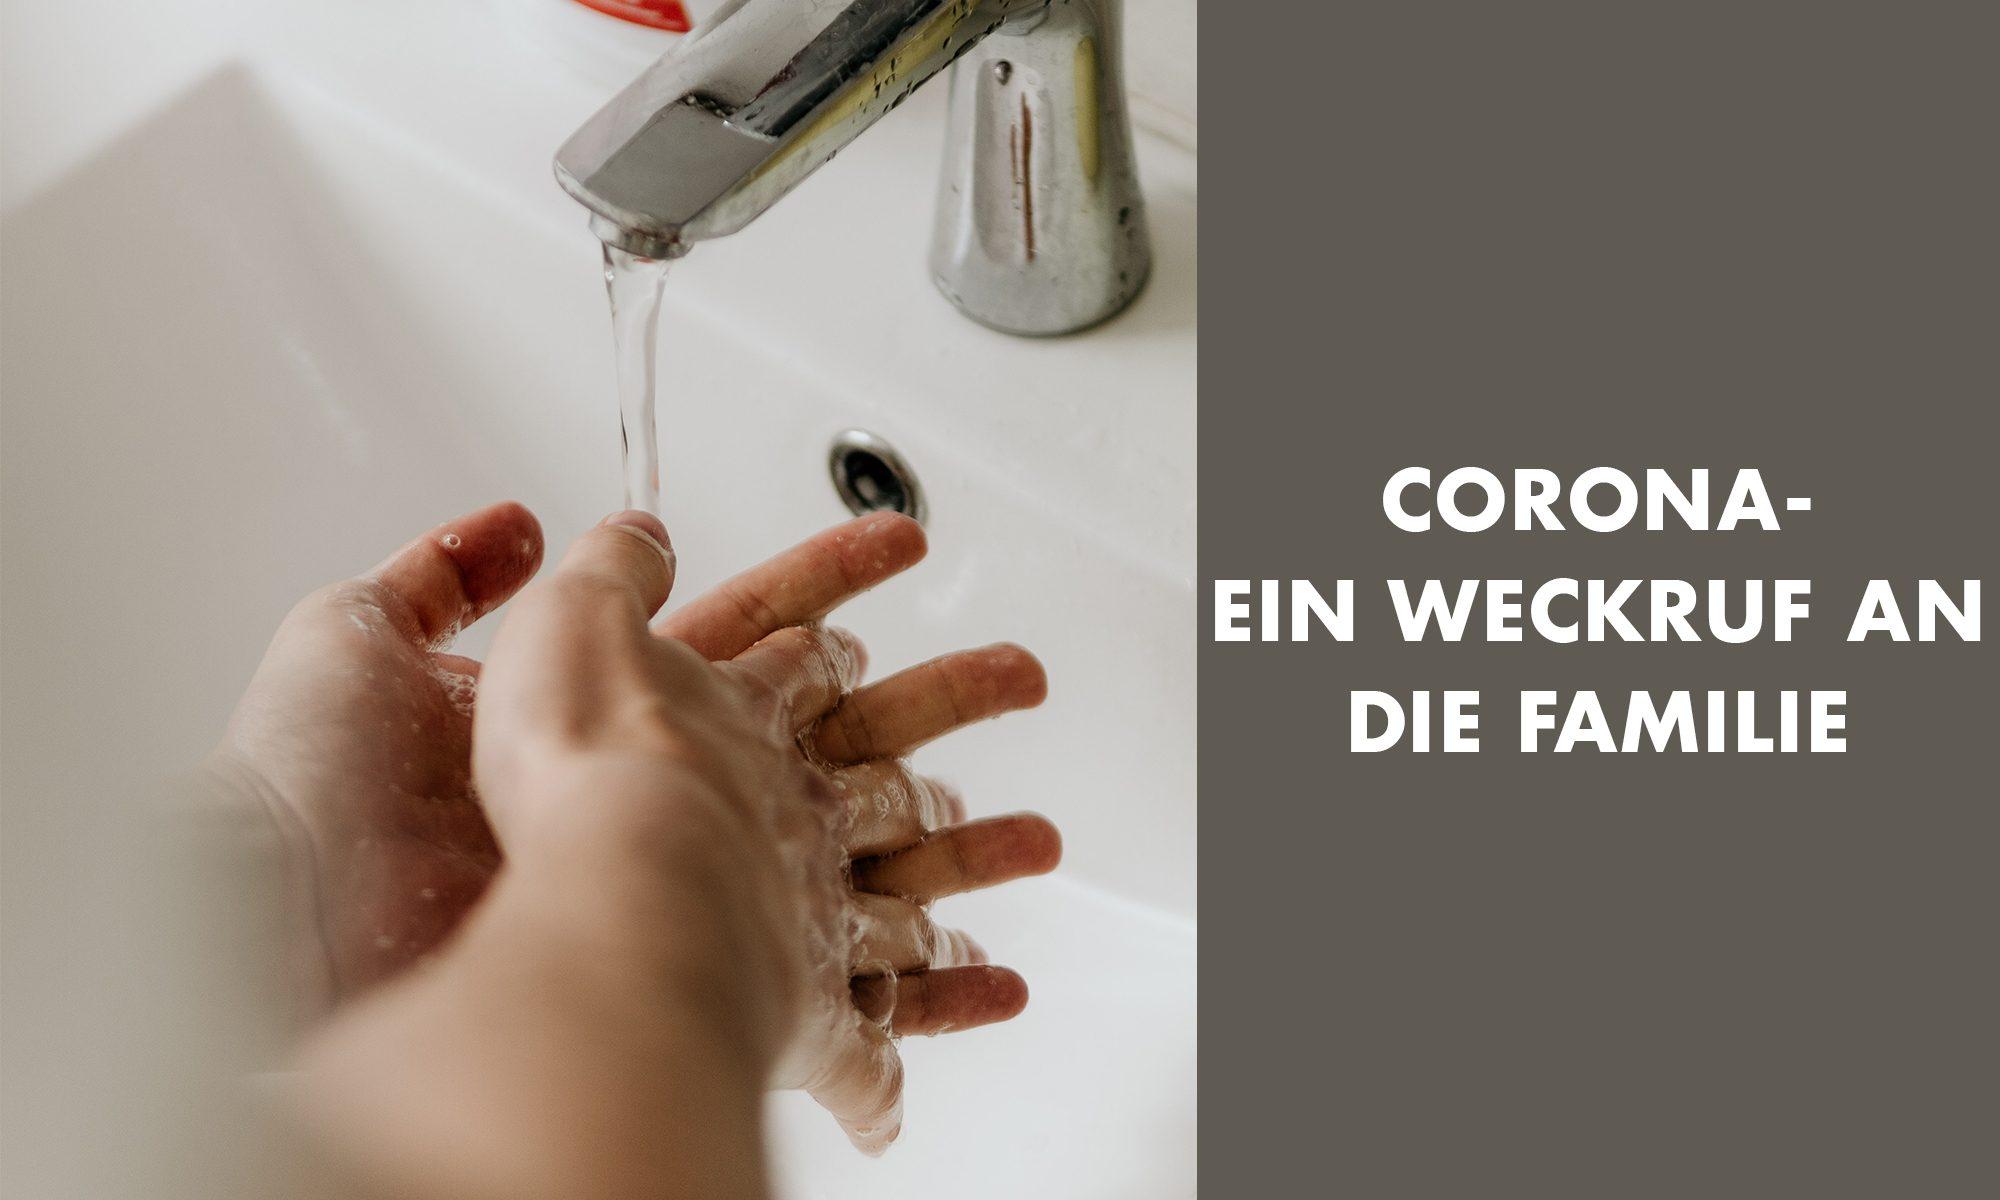 Corona-Weckruf